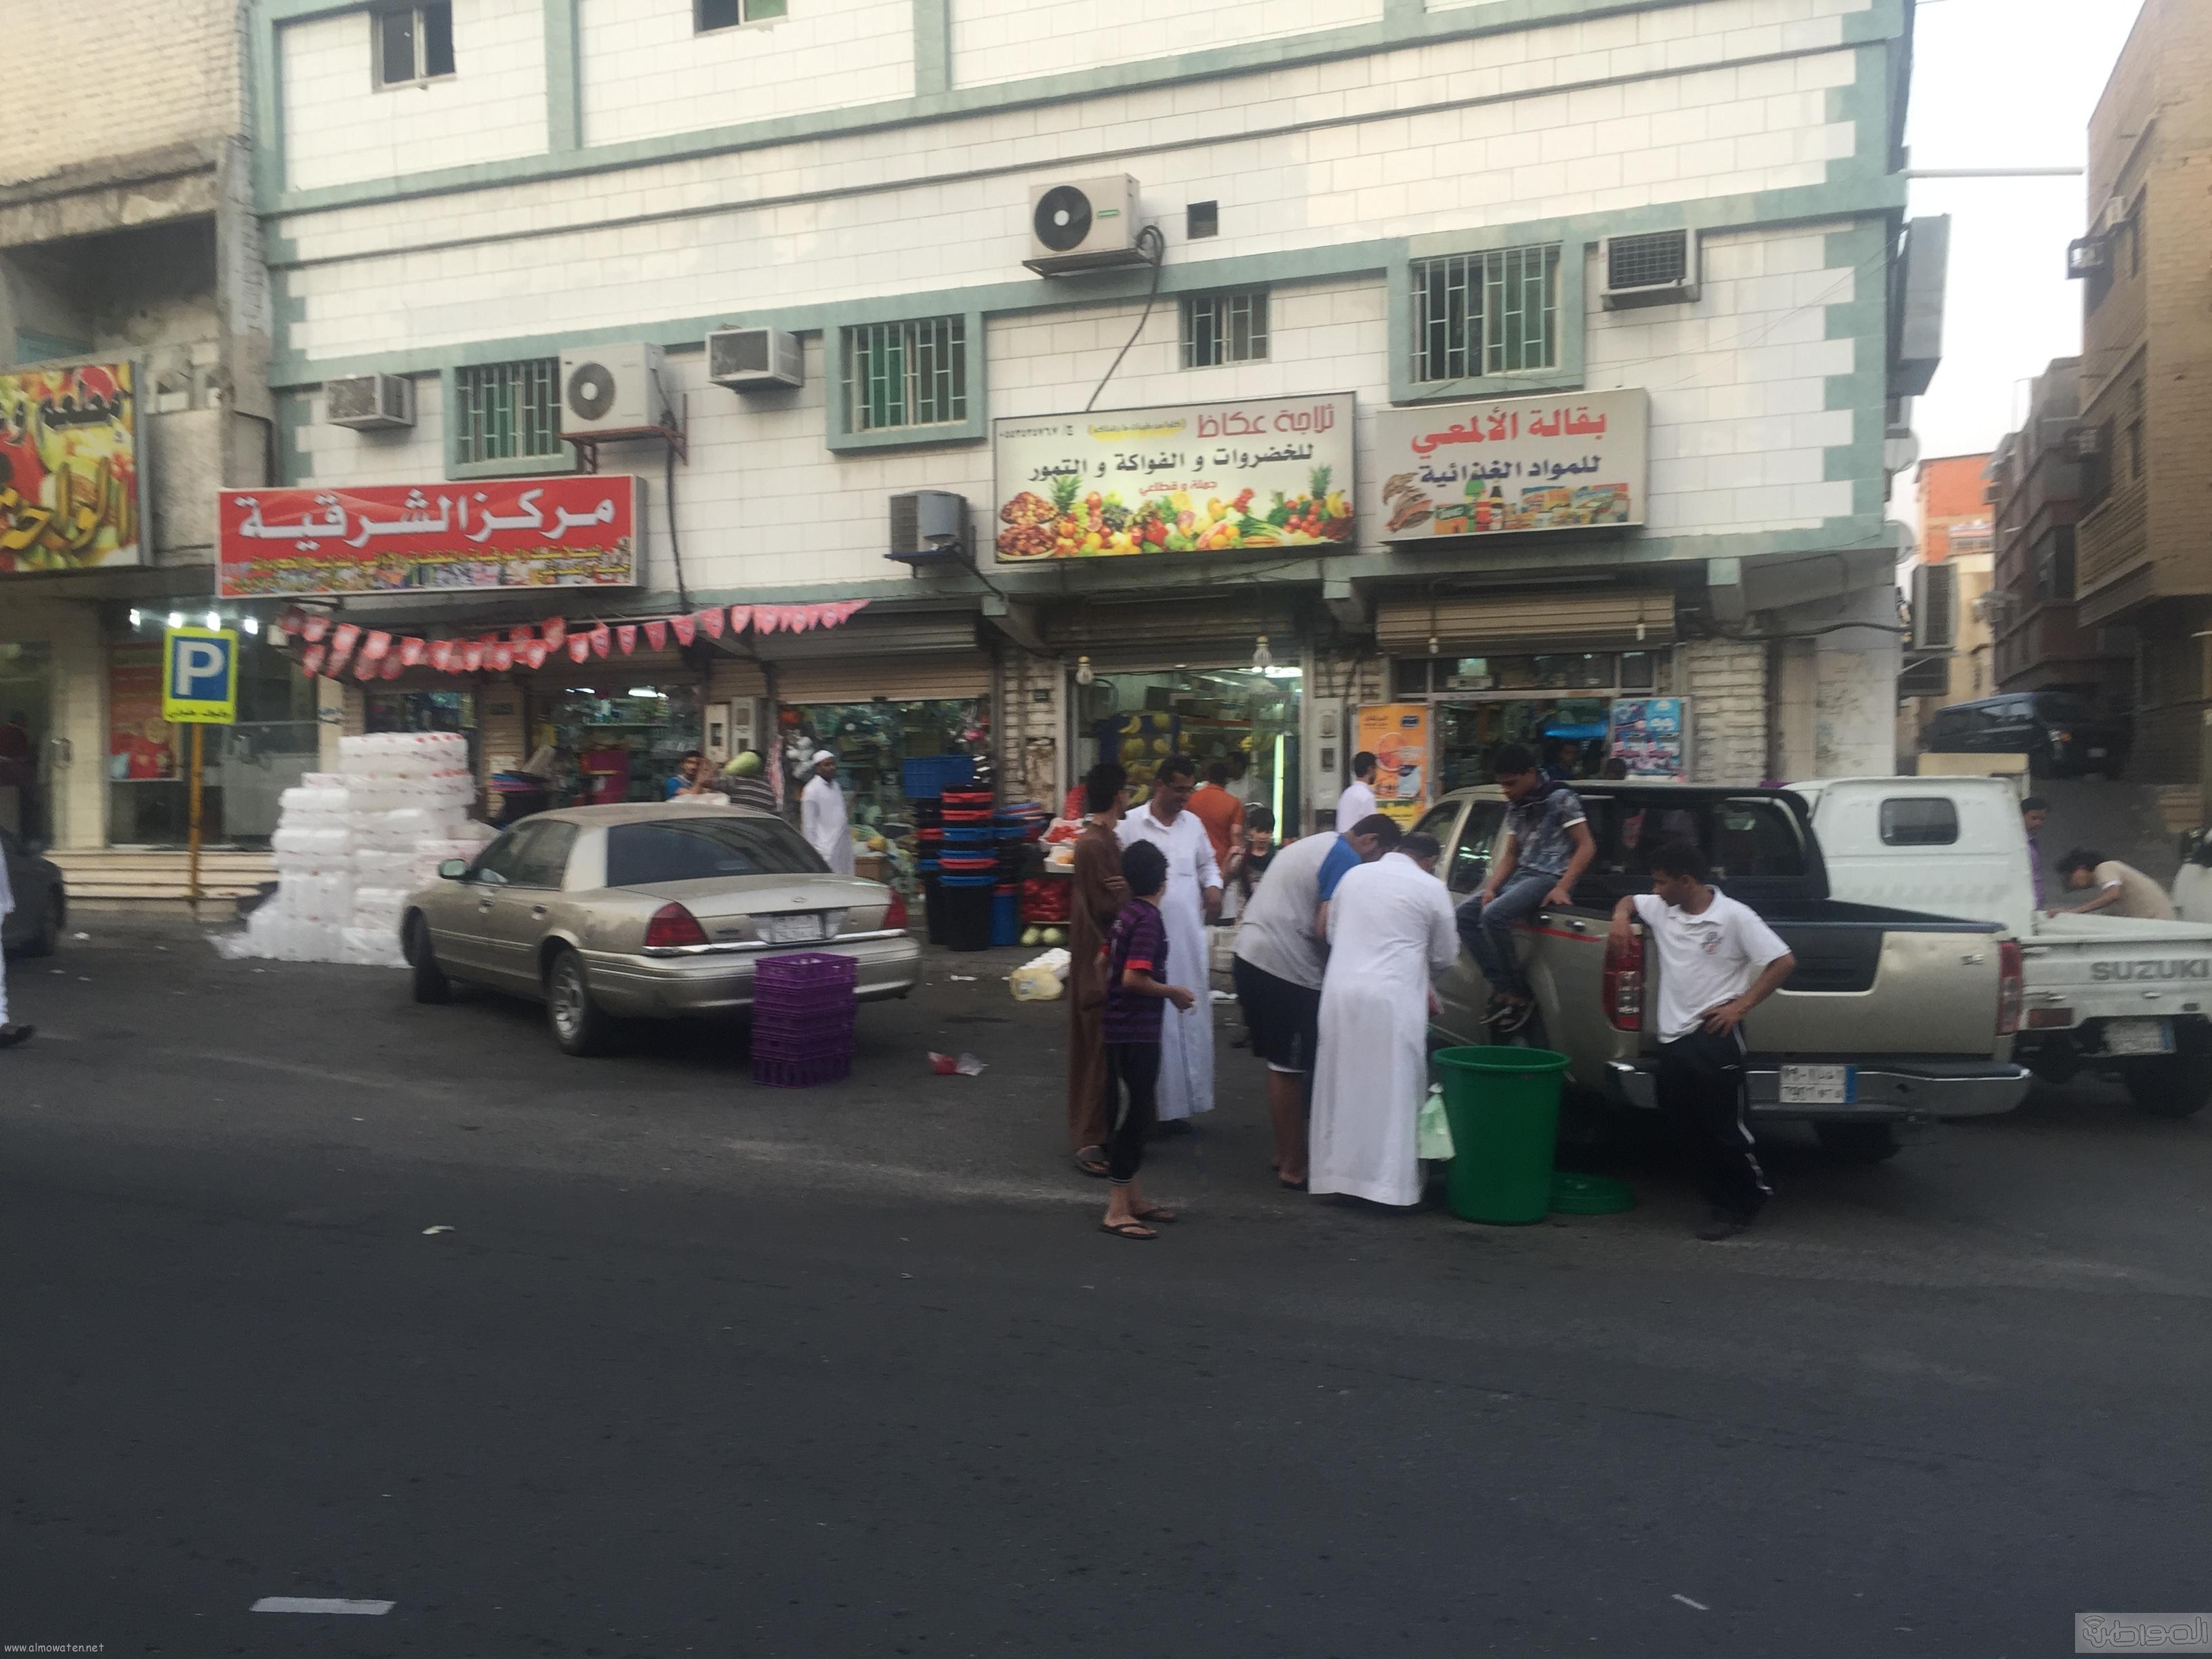 شارع عكاظ بالطائف زوار رمضان (10)